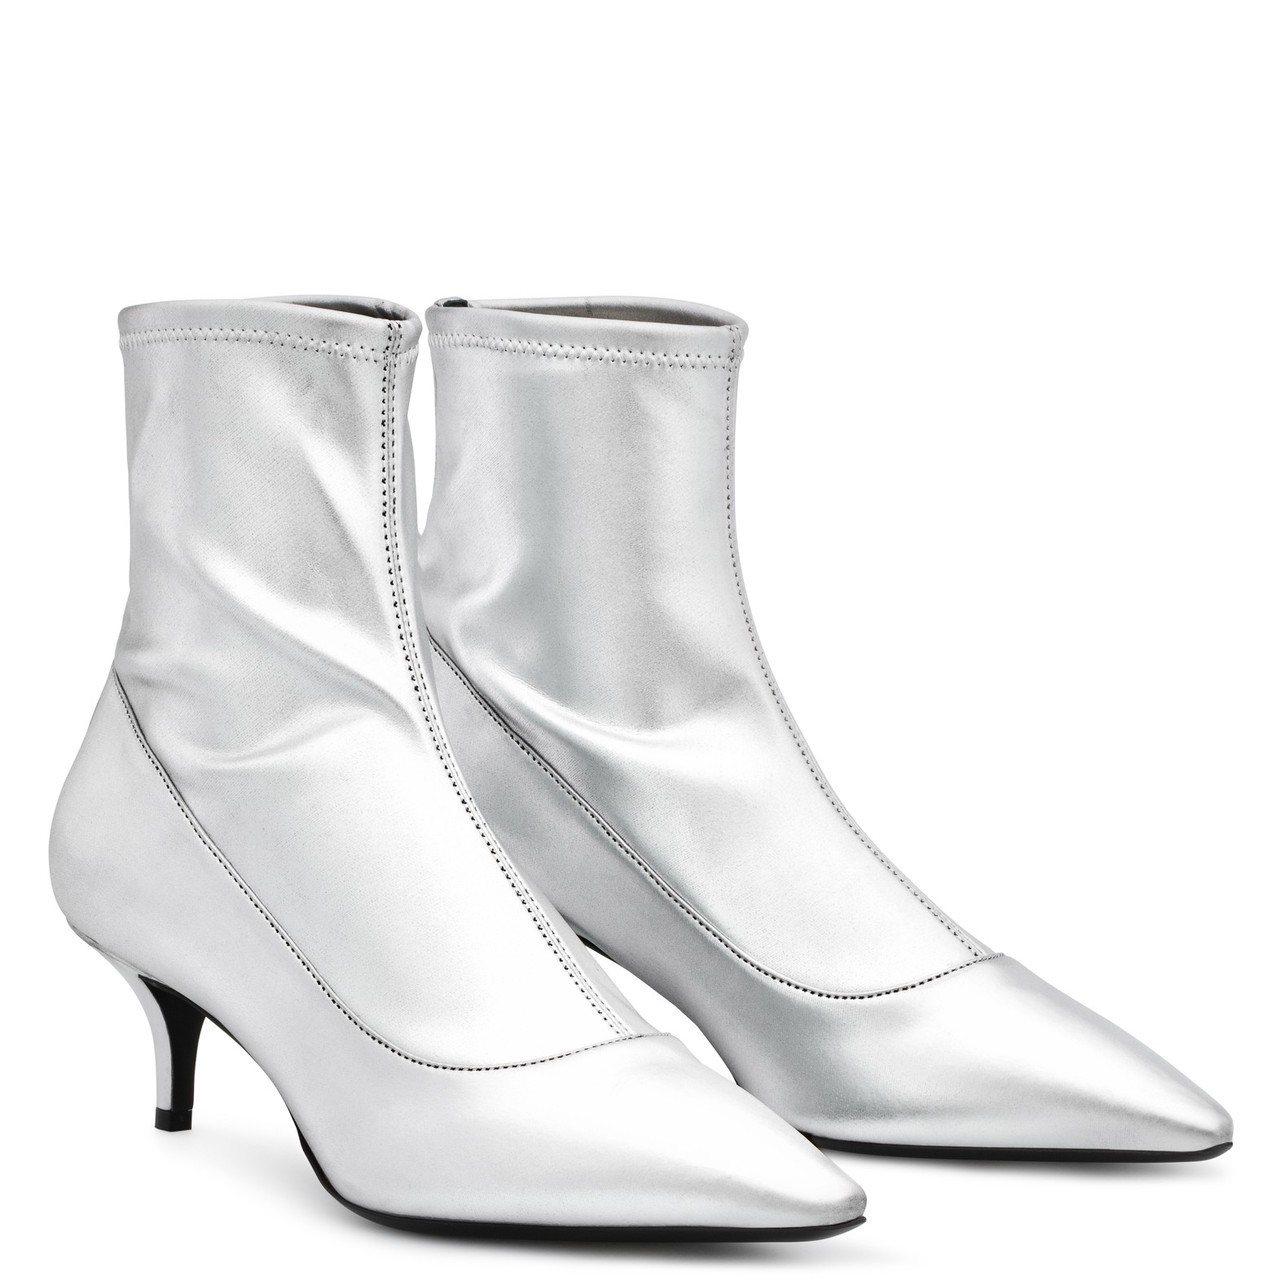 SALOMÈ銀色短靴,約33,000元。圖/Giuseppe Zanotti提供